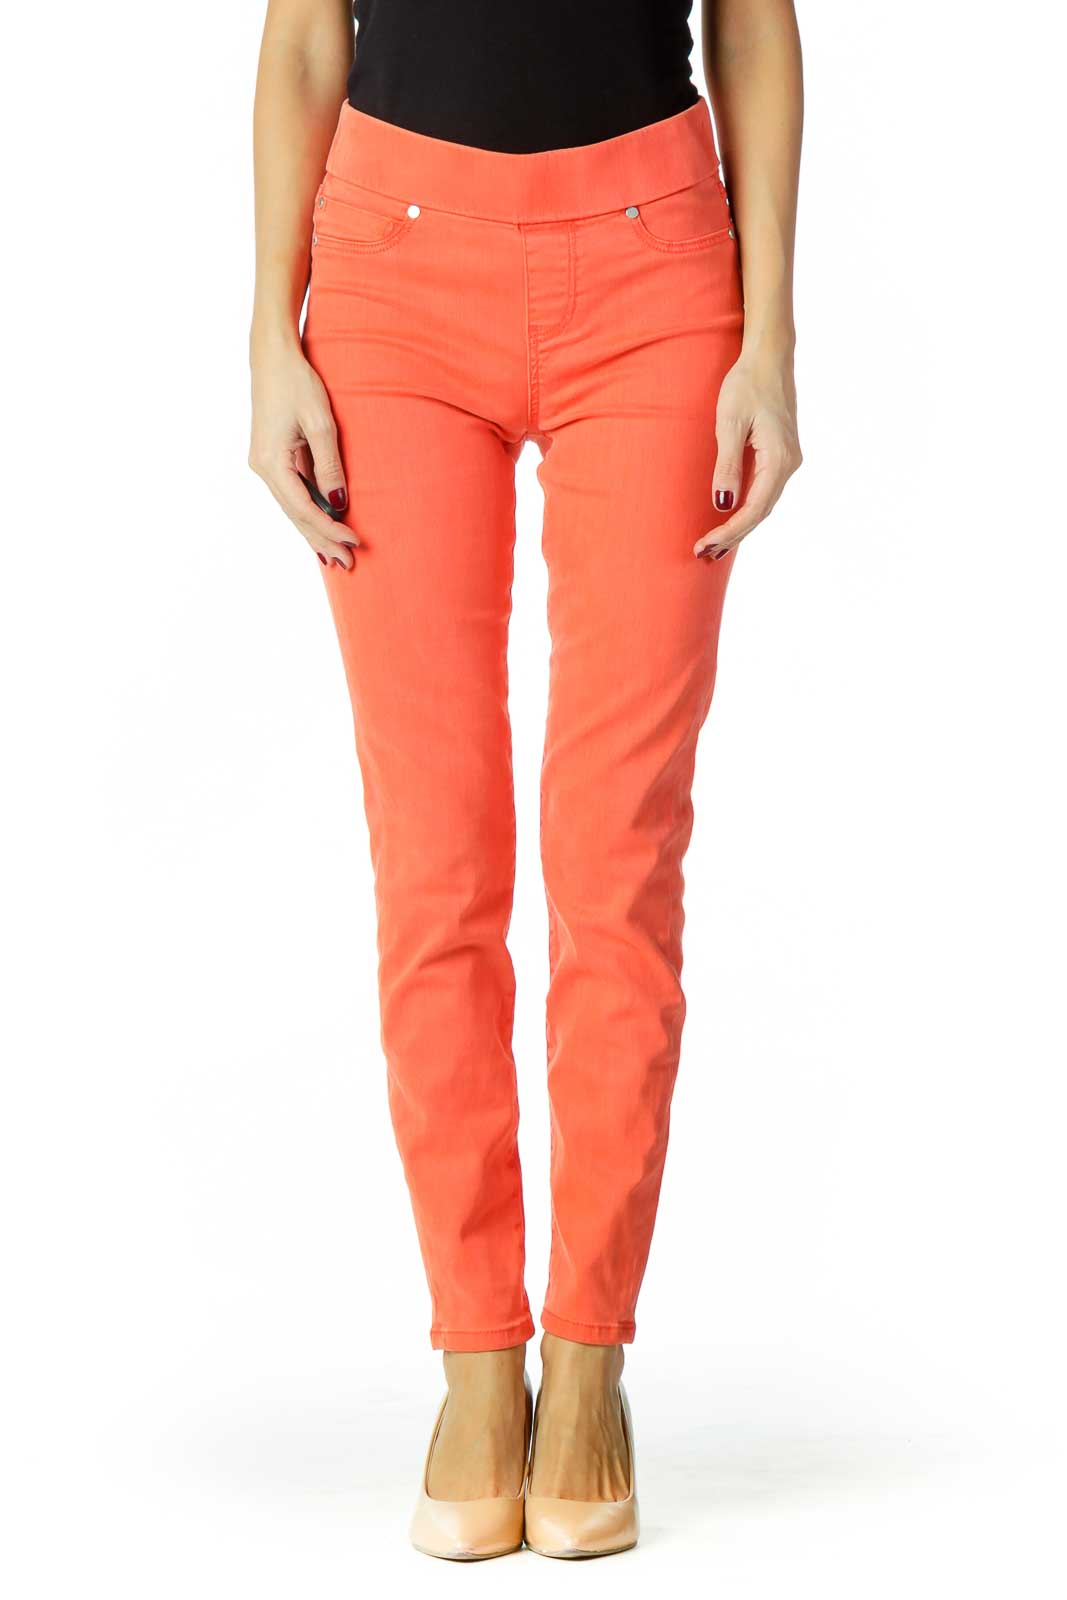 Orange Stretchy Skinny Jeans Front